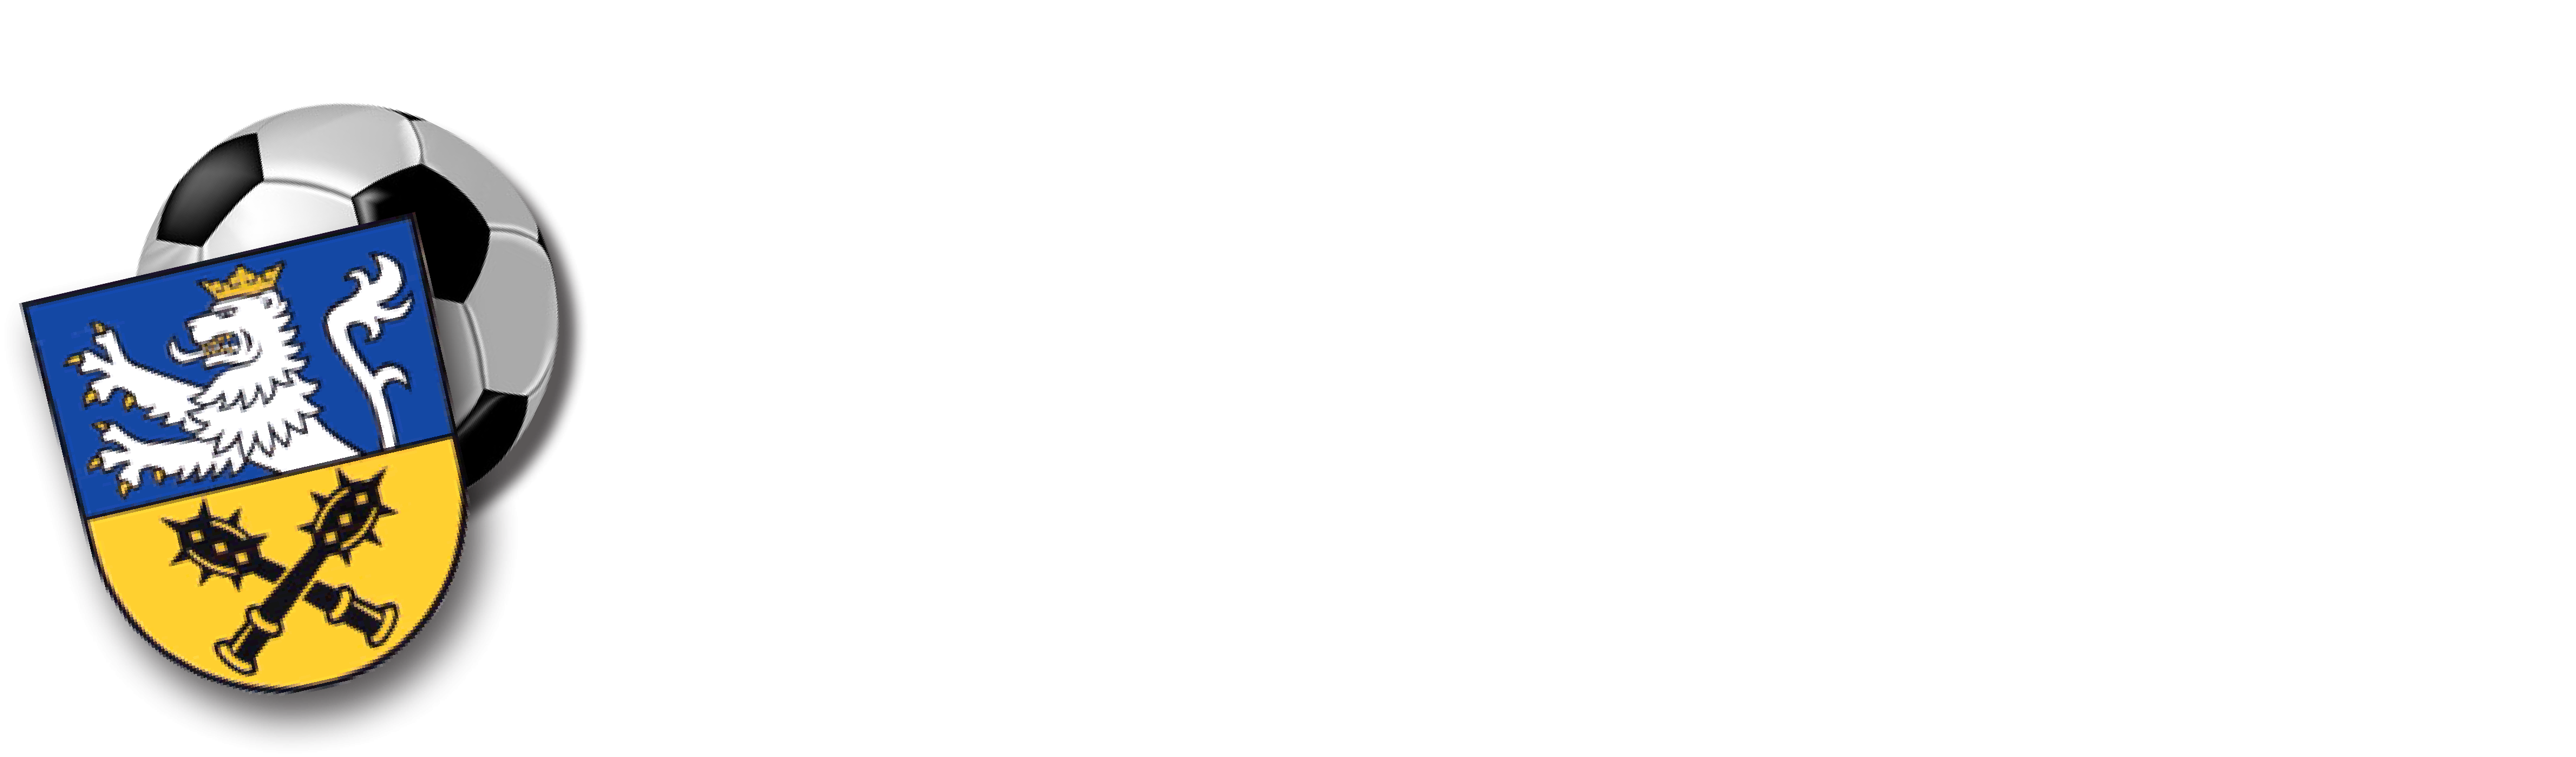 SV Fortuna Ingersleben